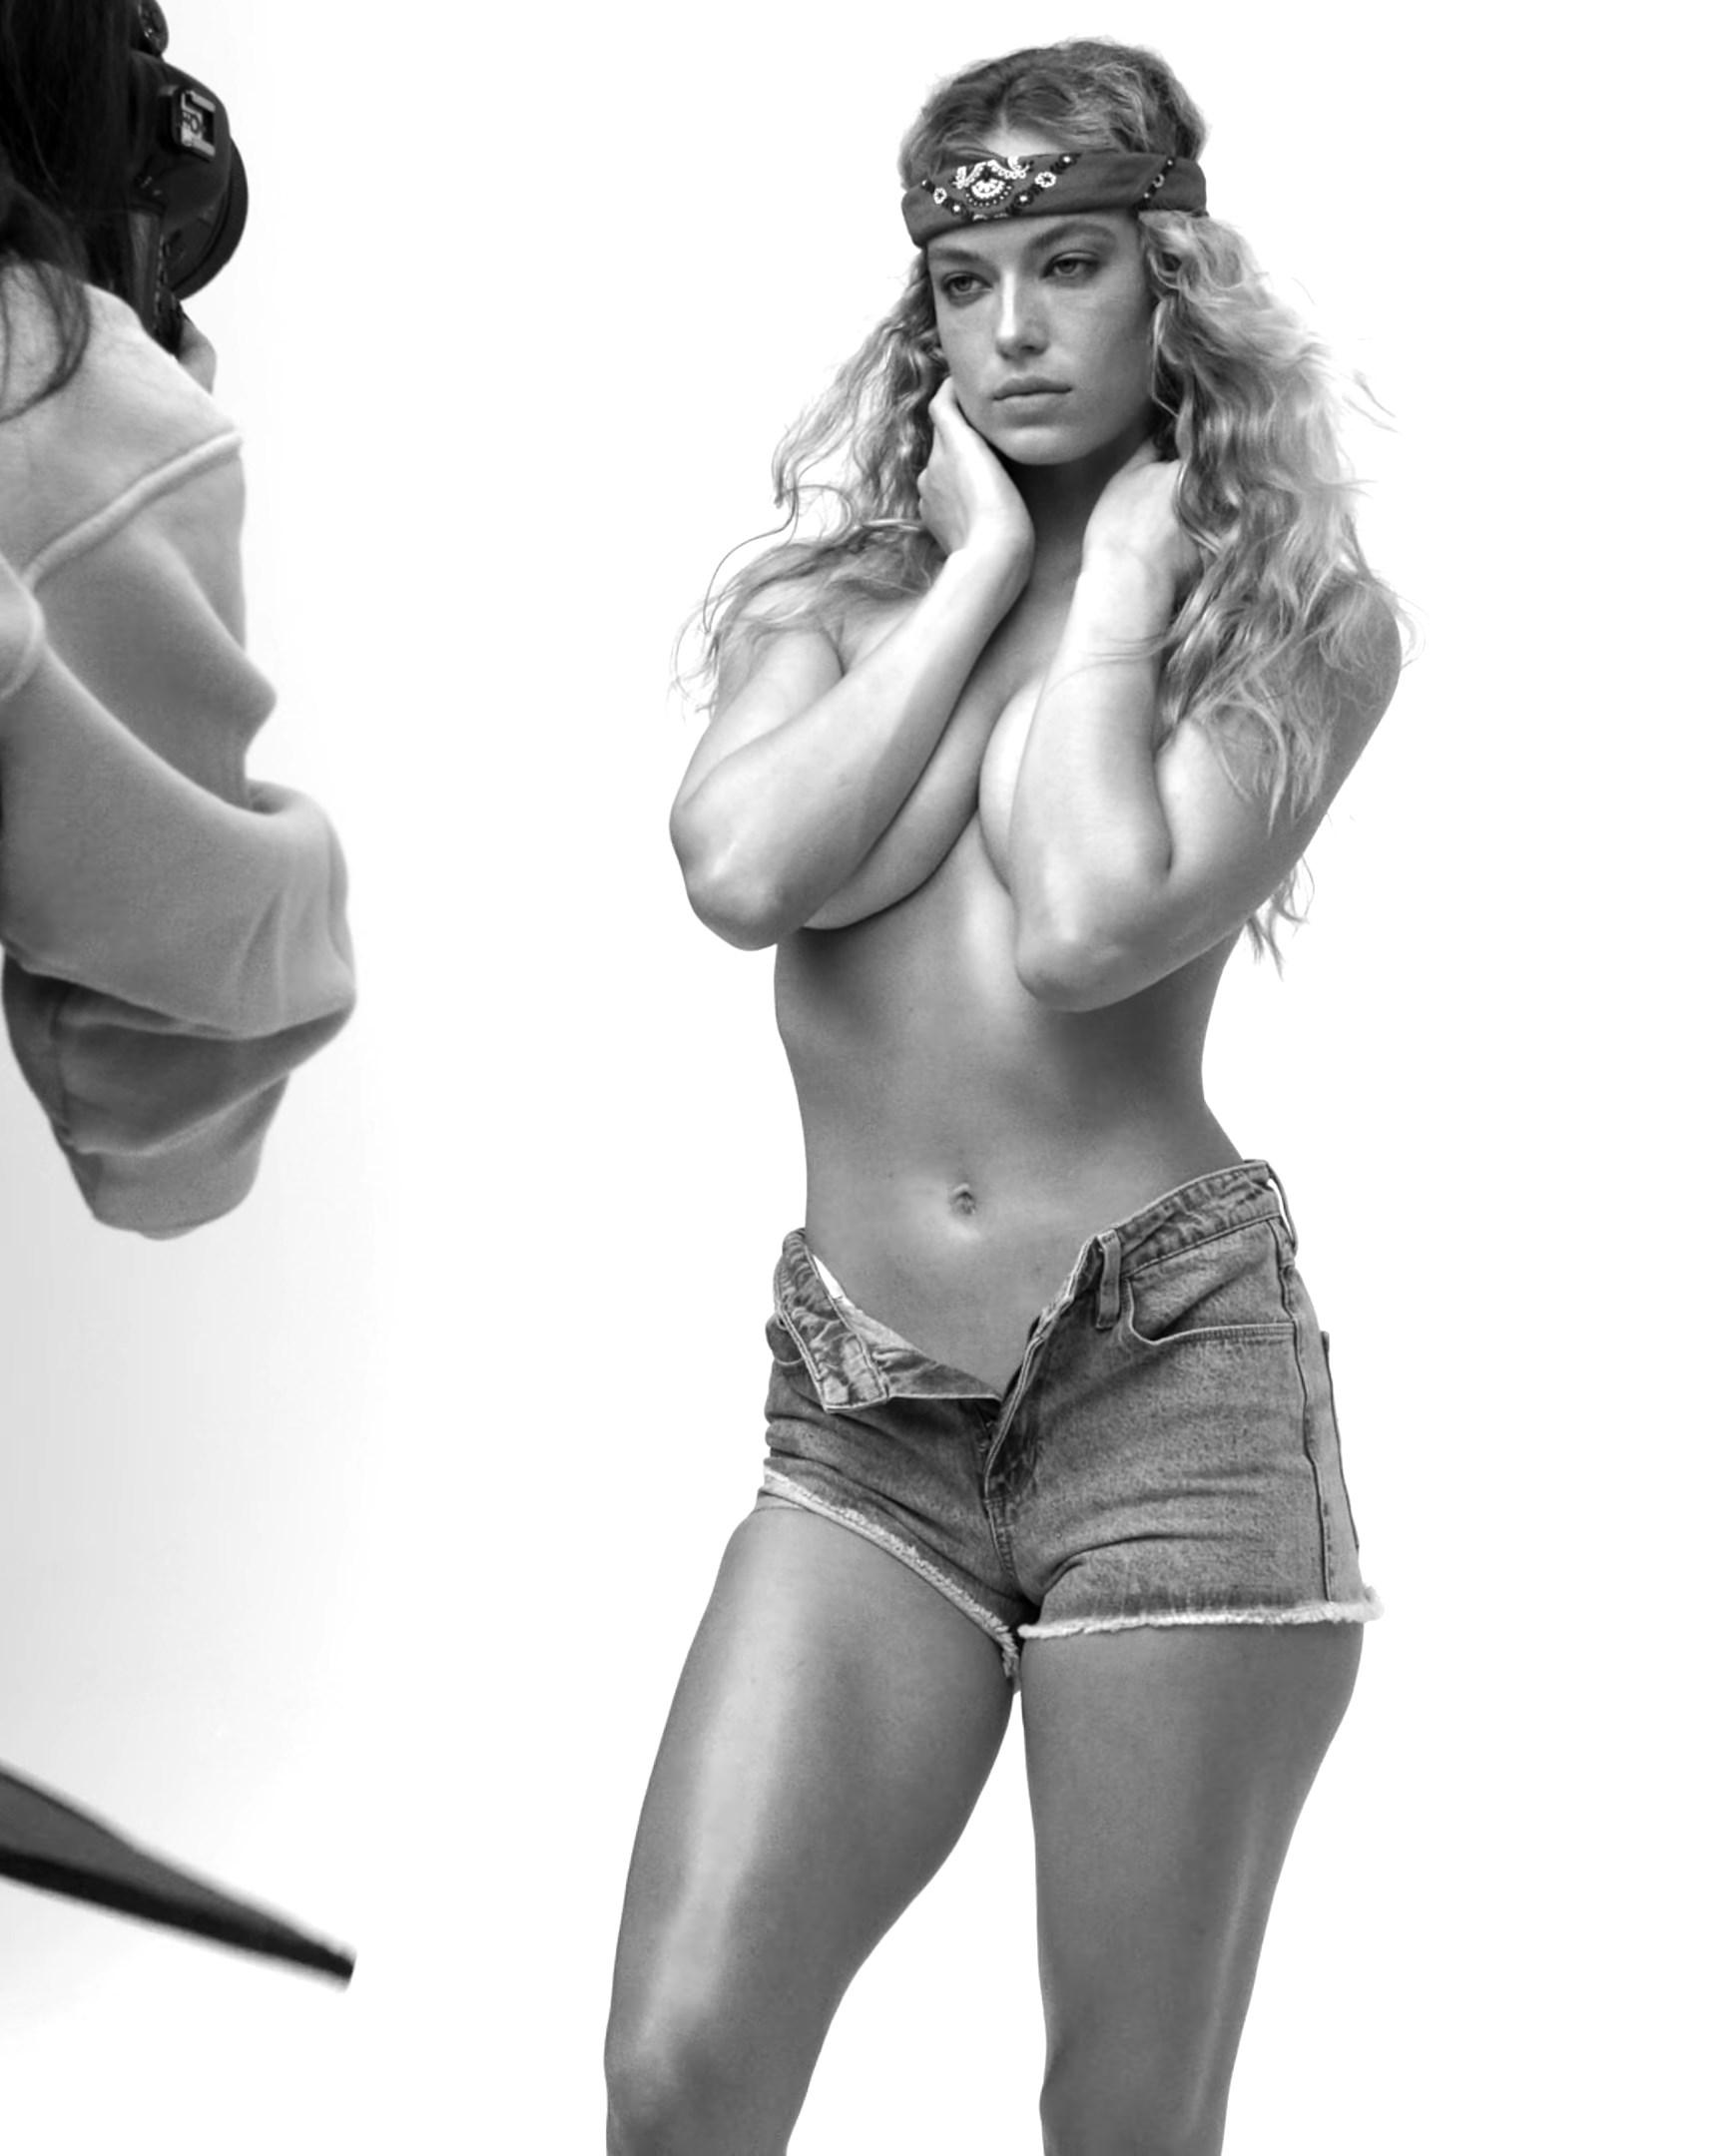 Casey batchelor nude pics